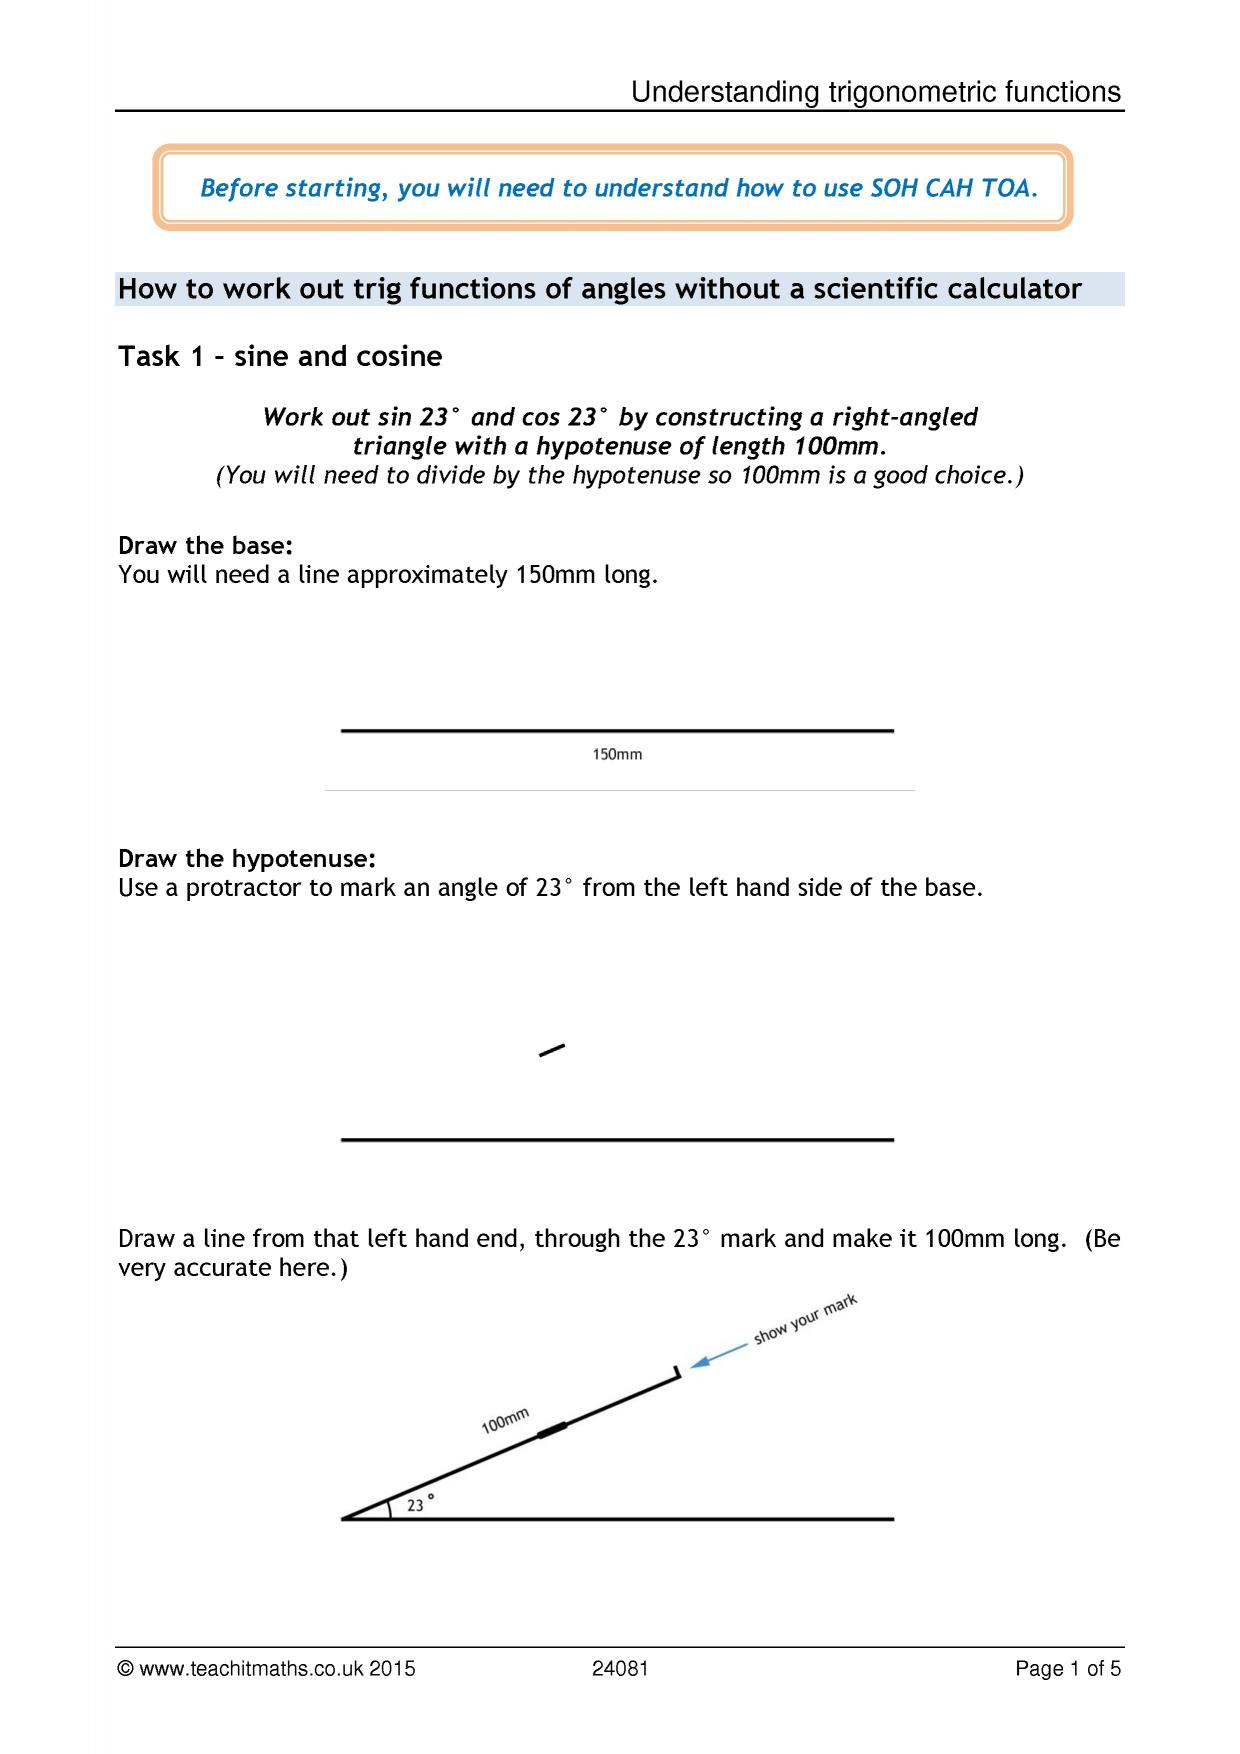 Trigonometry rich task array ks4 geometry and measure trigonometry u2013 sohcahtoa teachit maths rh teachitmaths fandeluxe Gallery